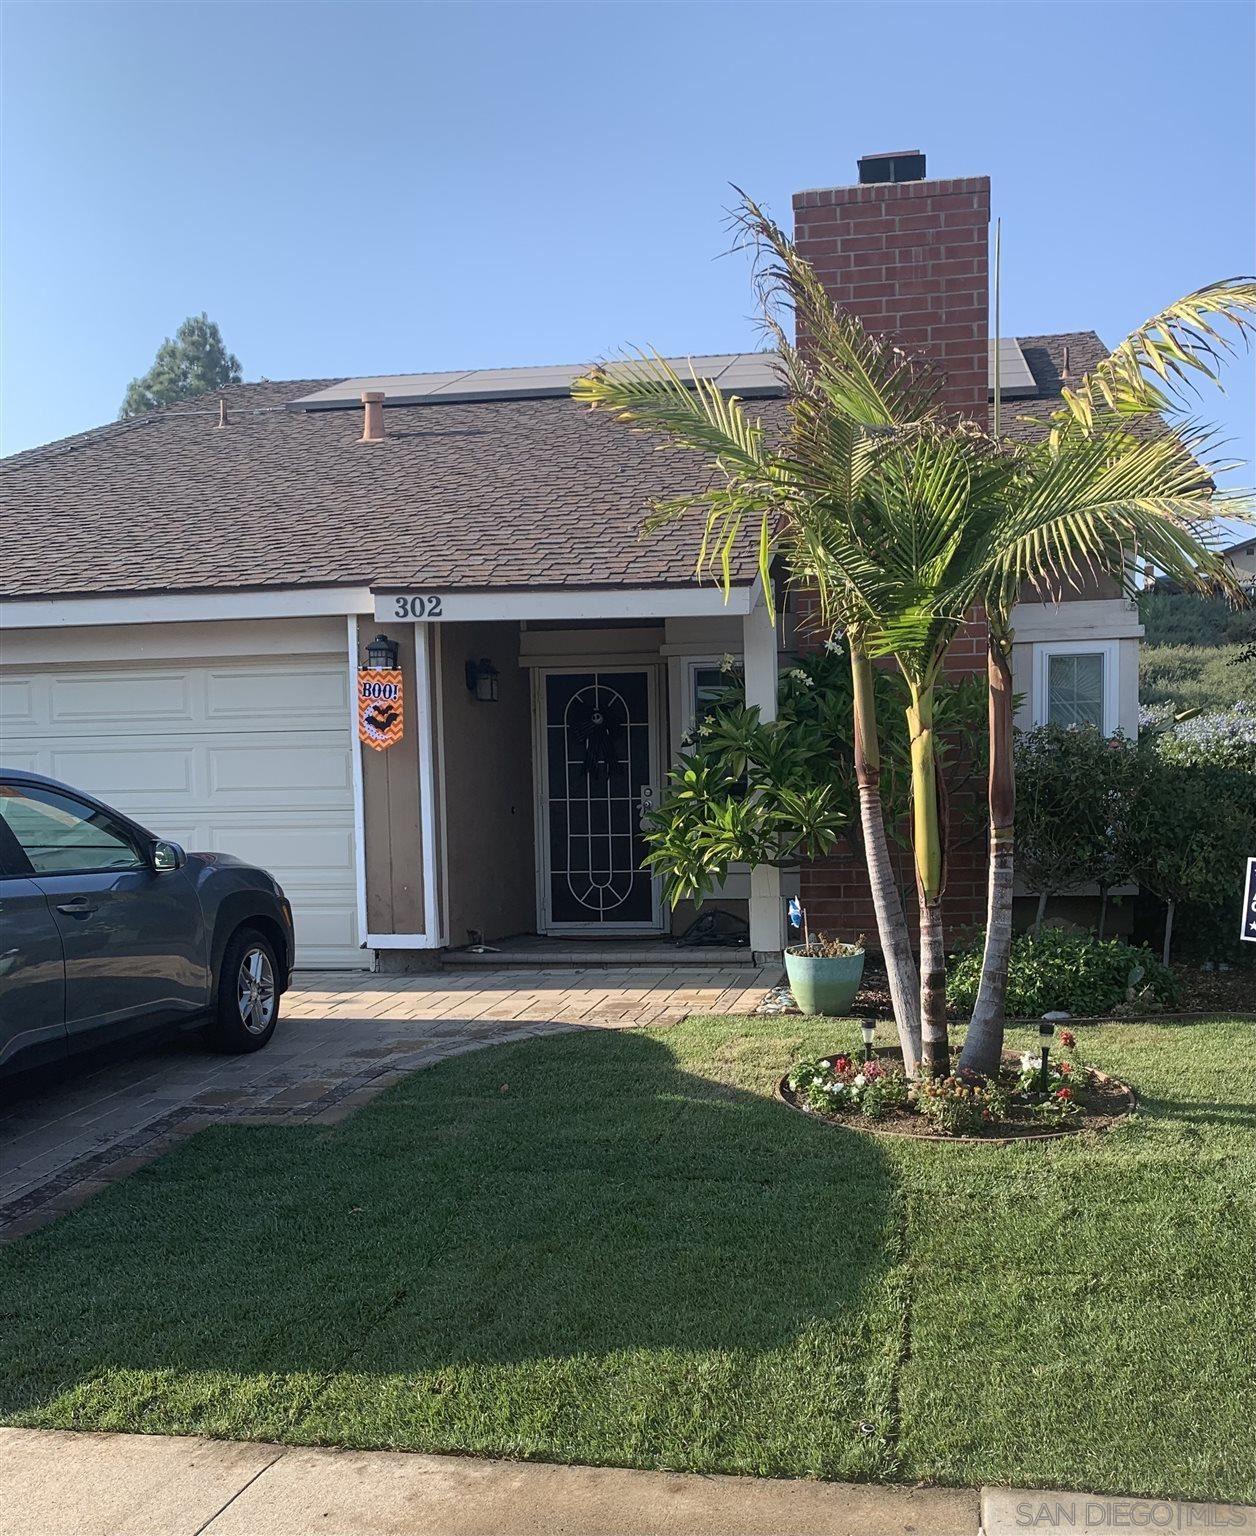 Photo of 302 Eastridge Lane, Escondido, CA 92026 (MLS # 210008837)